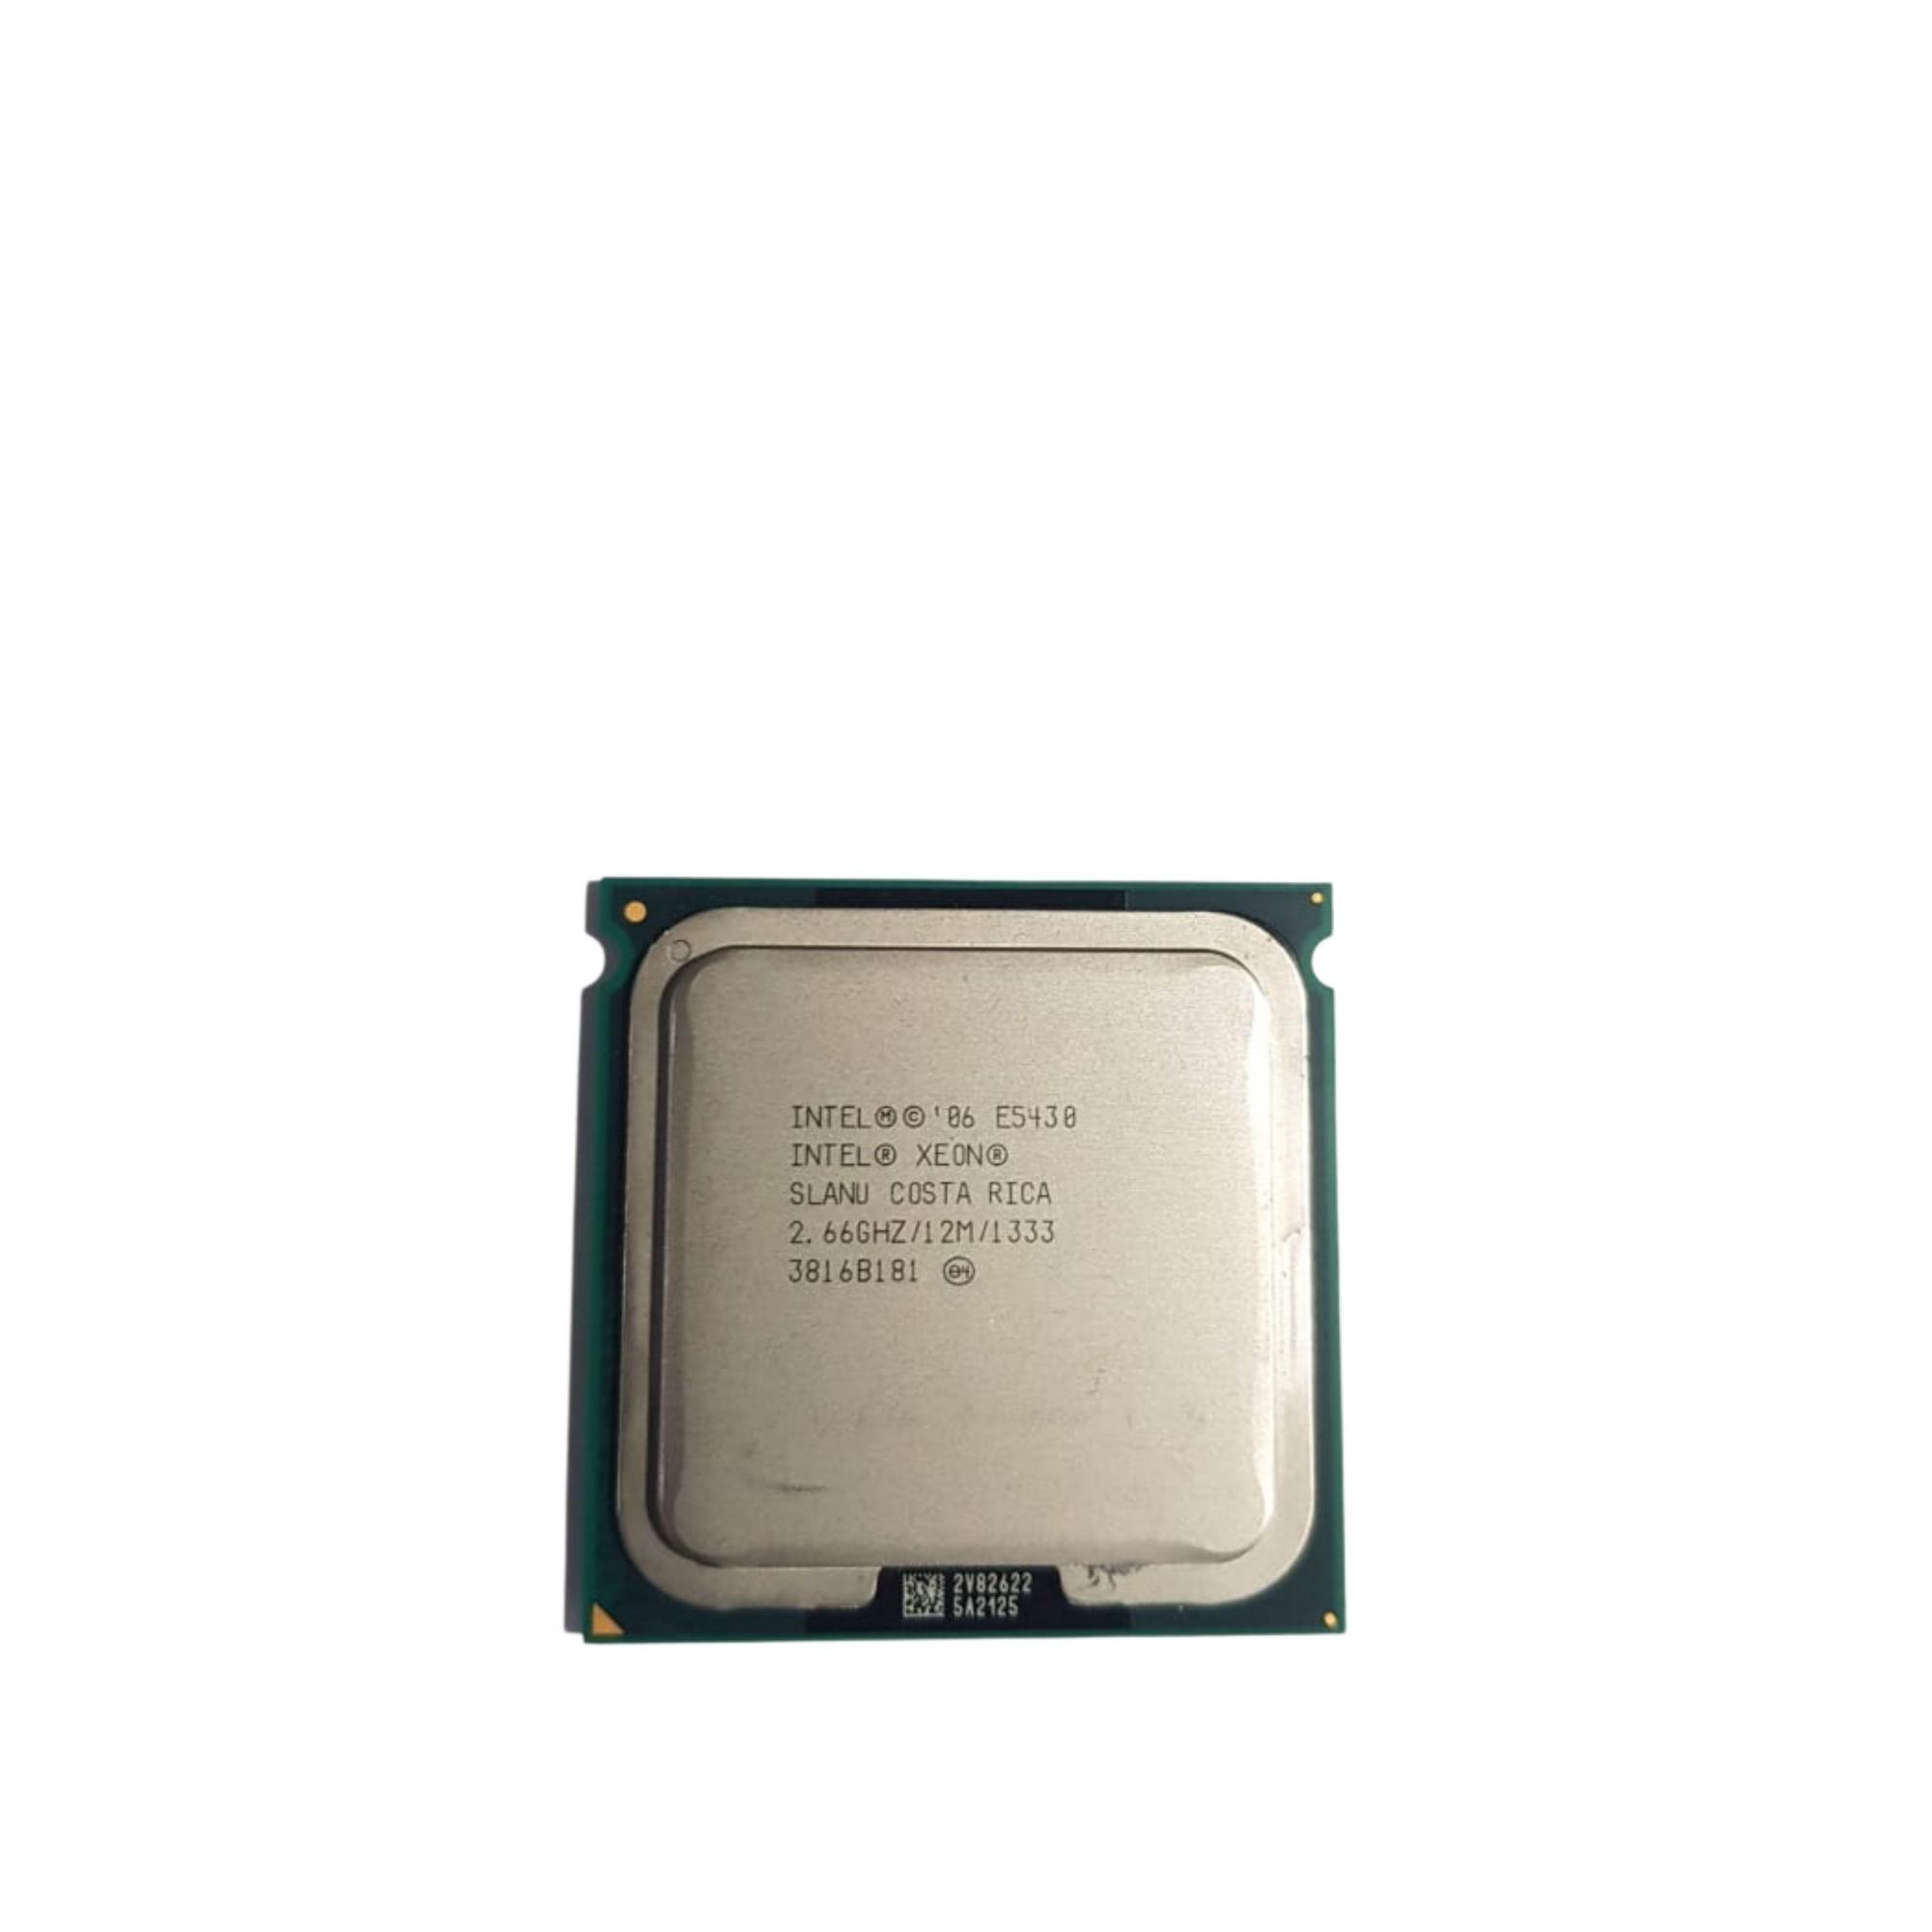 Processador Intel Xeon E5430 Lga771 2.66ghz 12mb